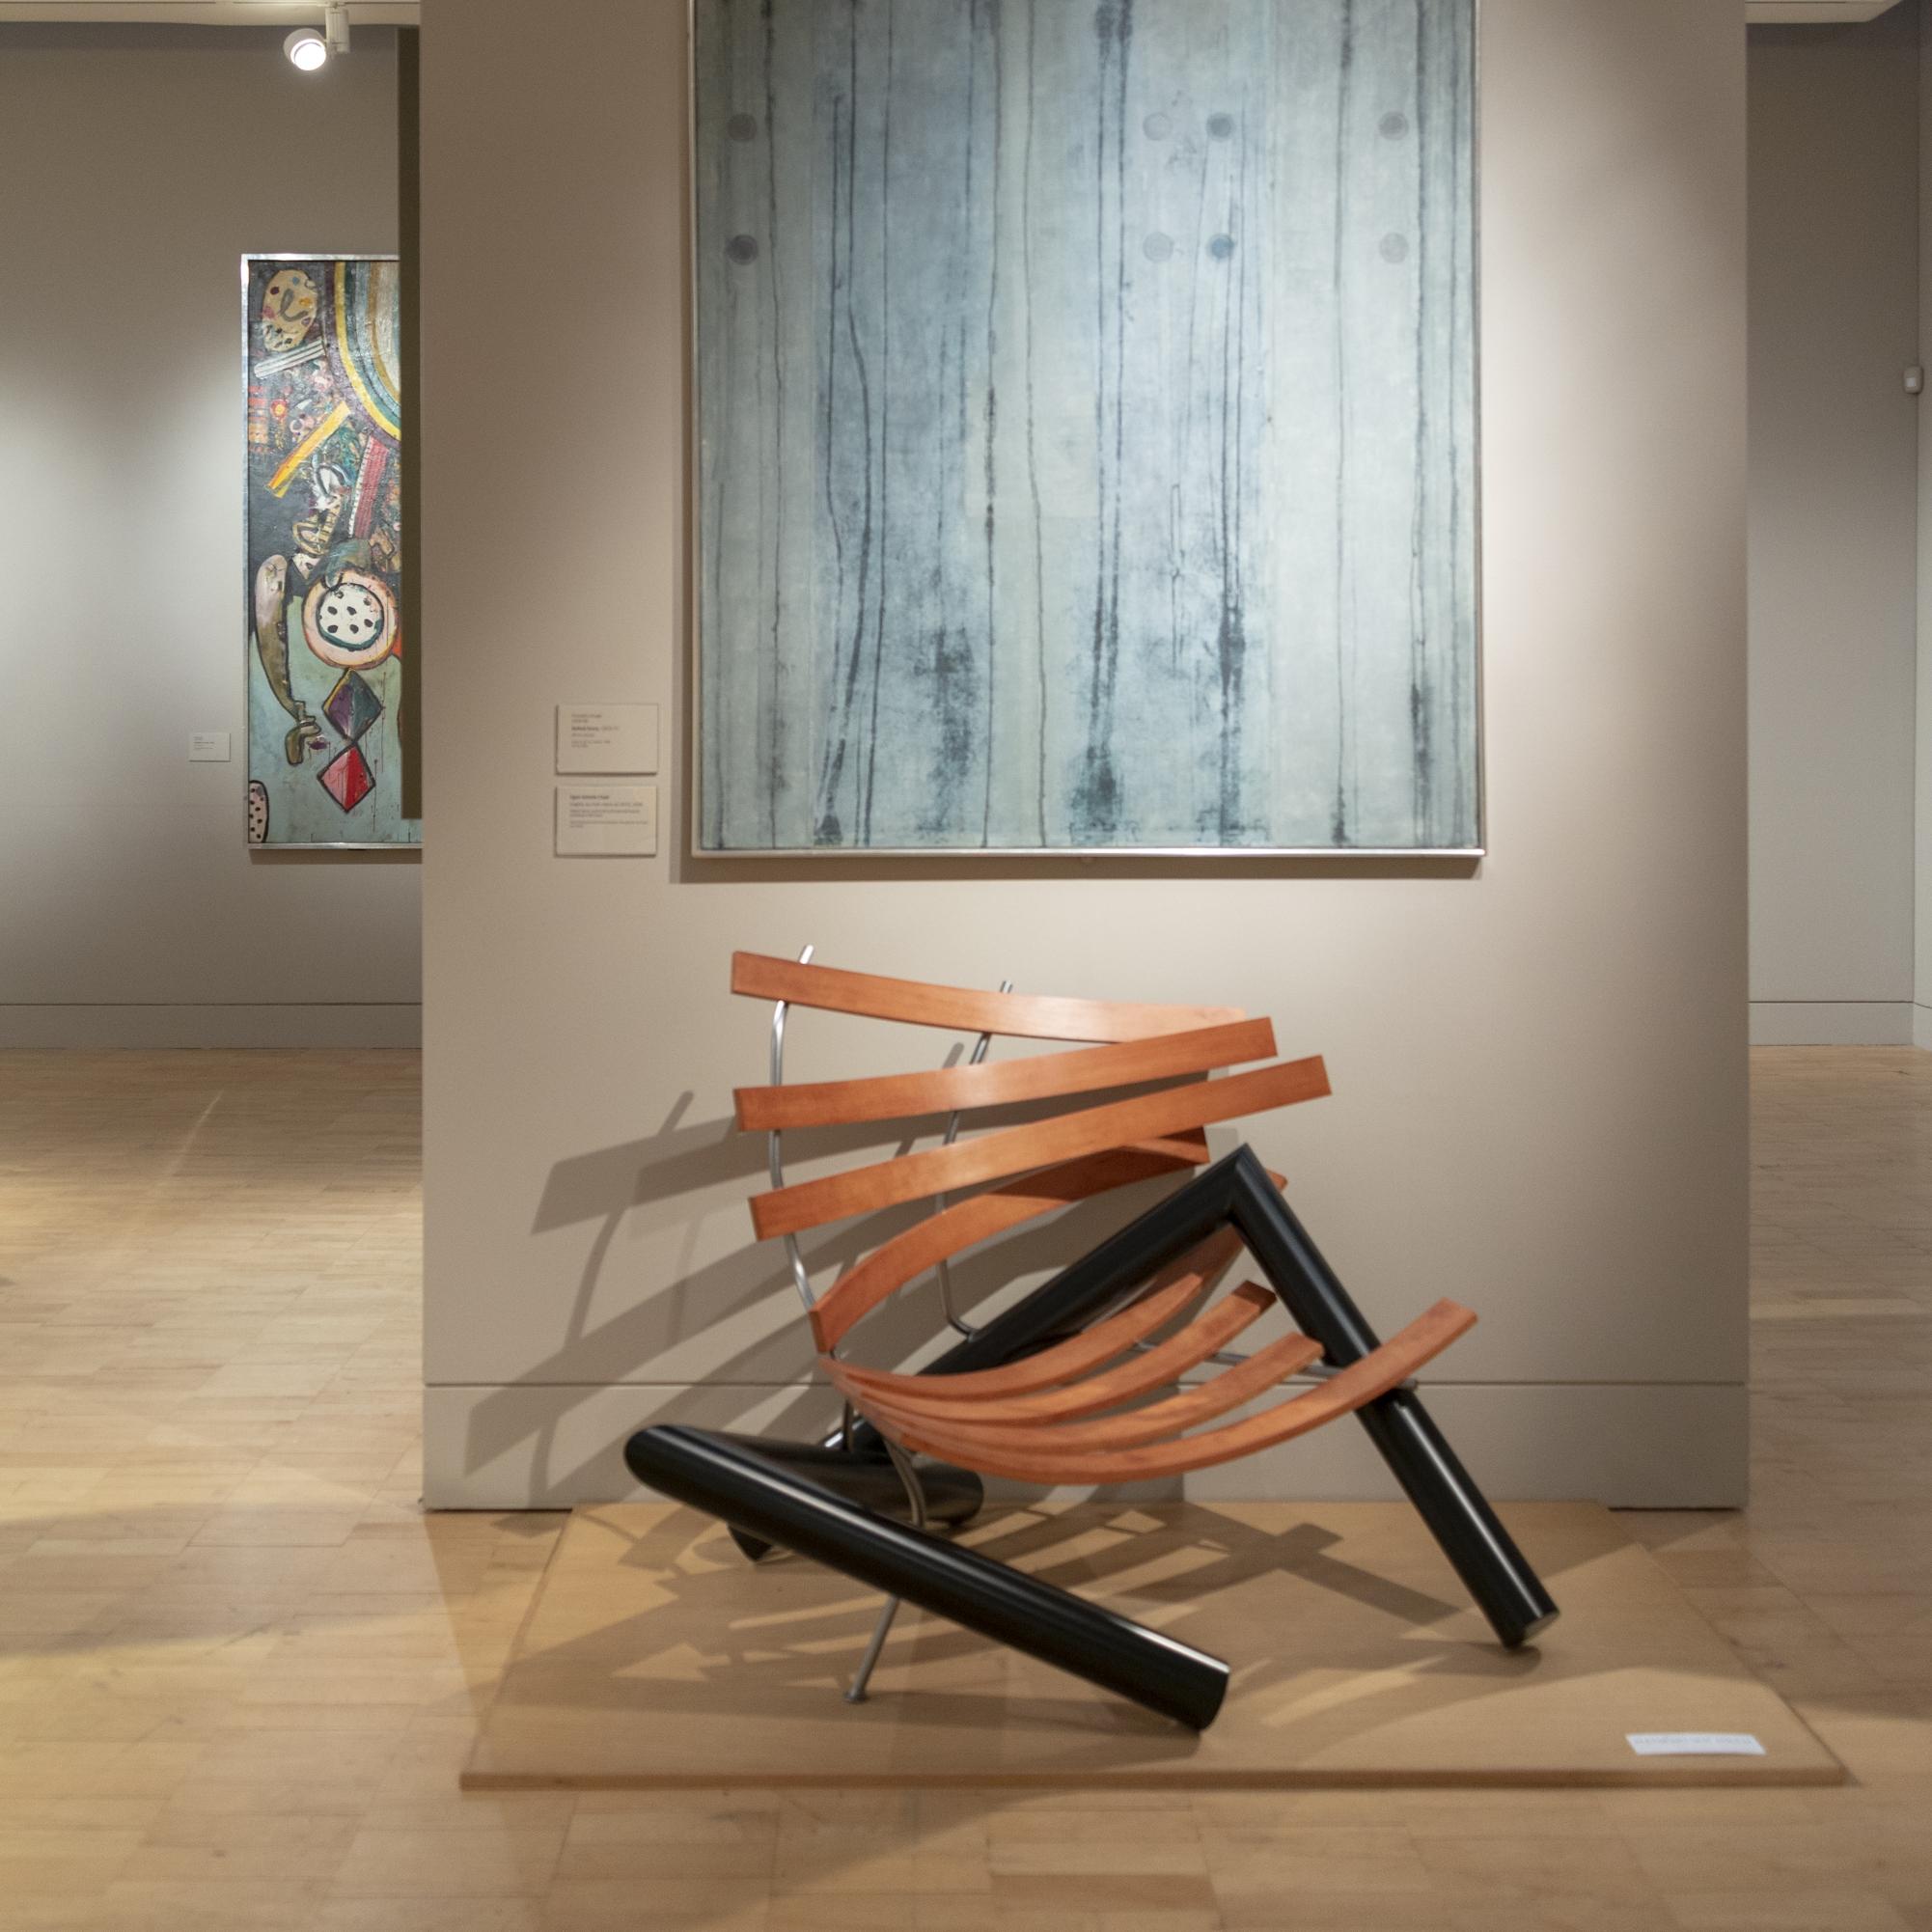 Gallery 11_Schiele Chair_3_201810_mfj22_dc1.jpg